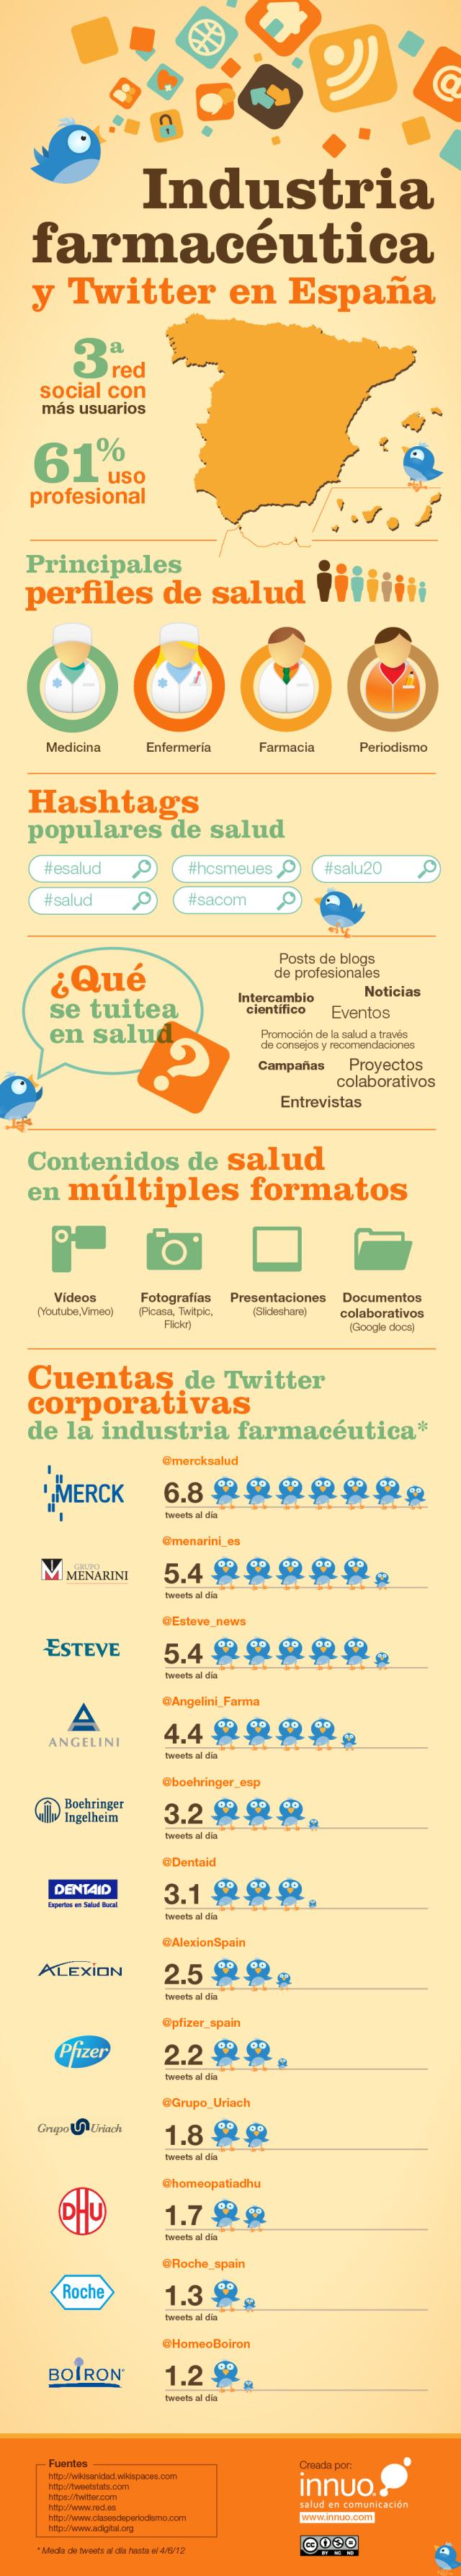 Industria farmaceutica España Twitter 20122